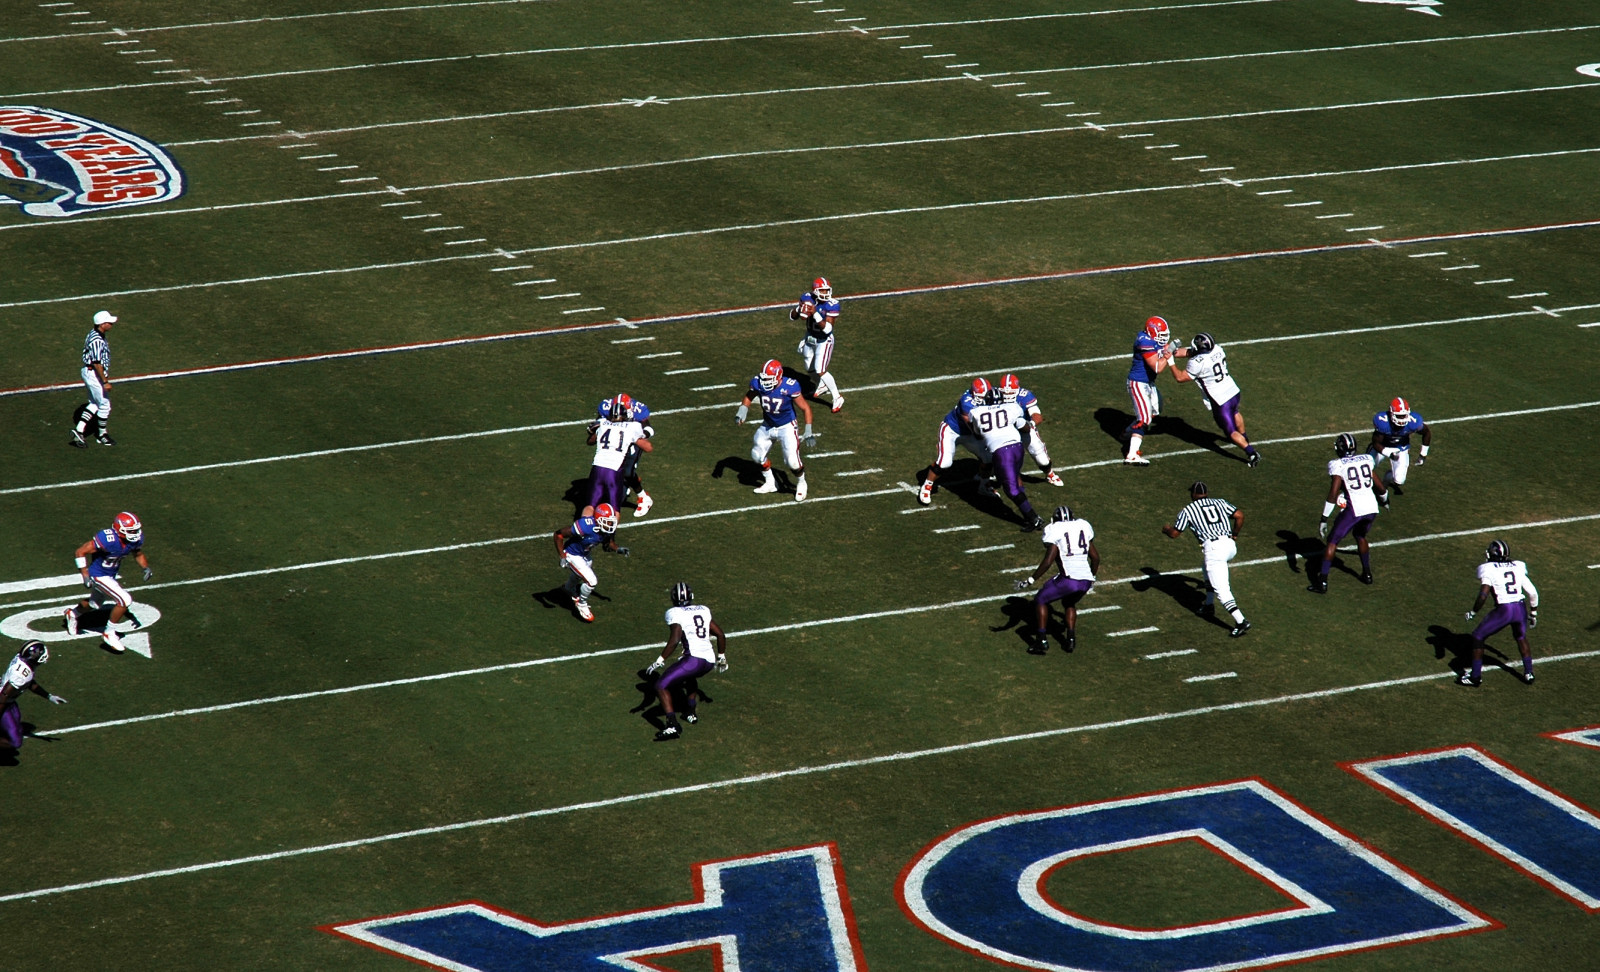 SportsTips' College Football Best Bets for Week 13